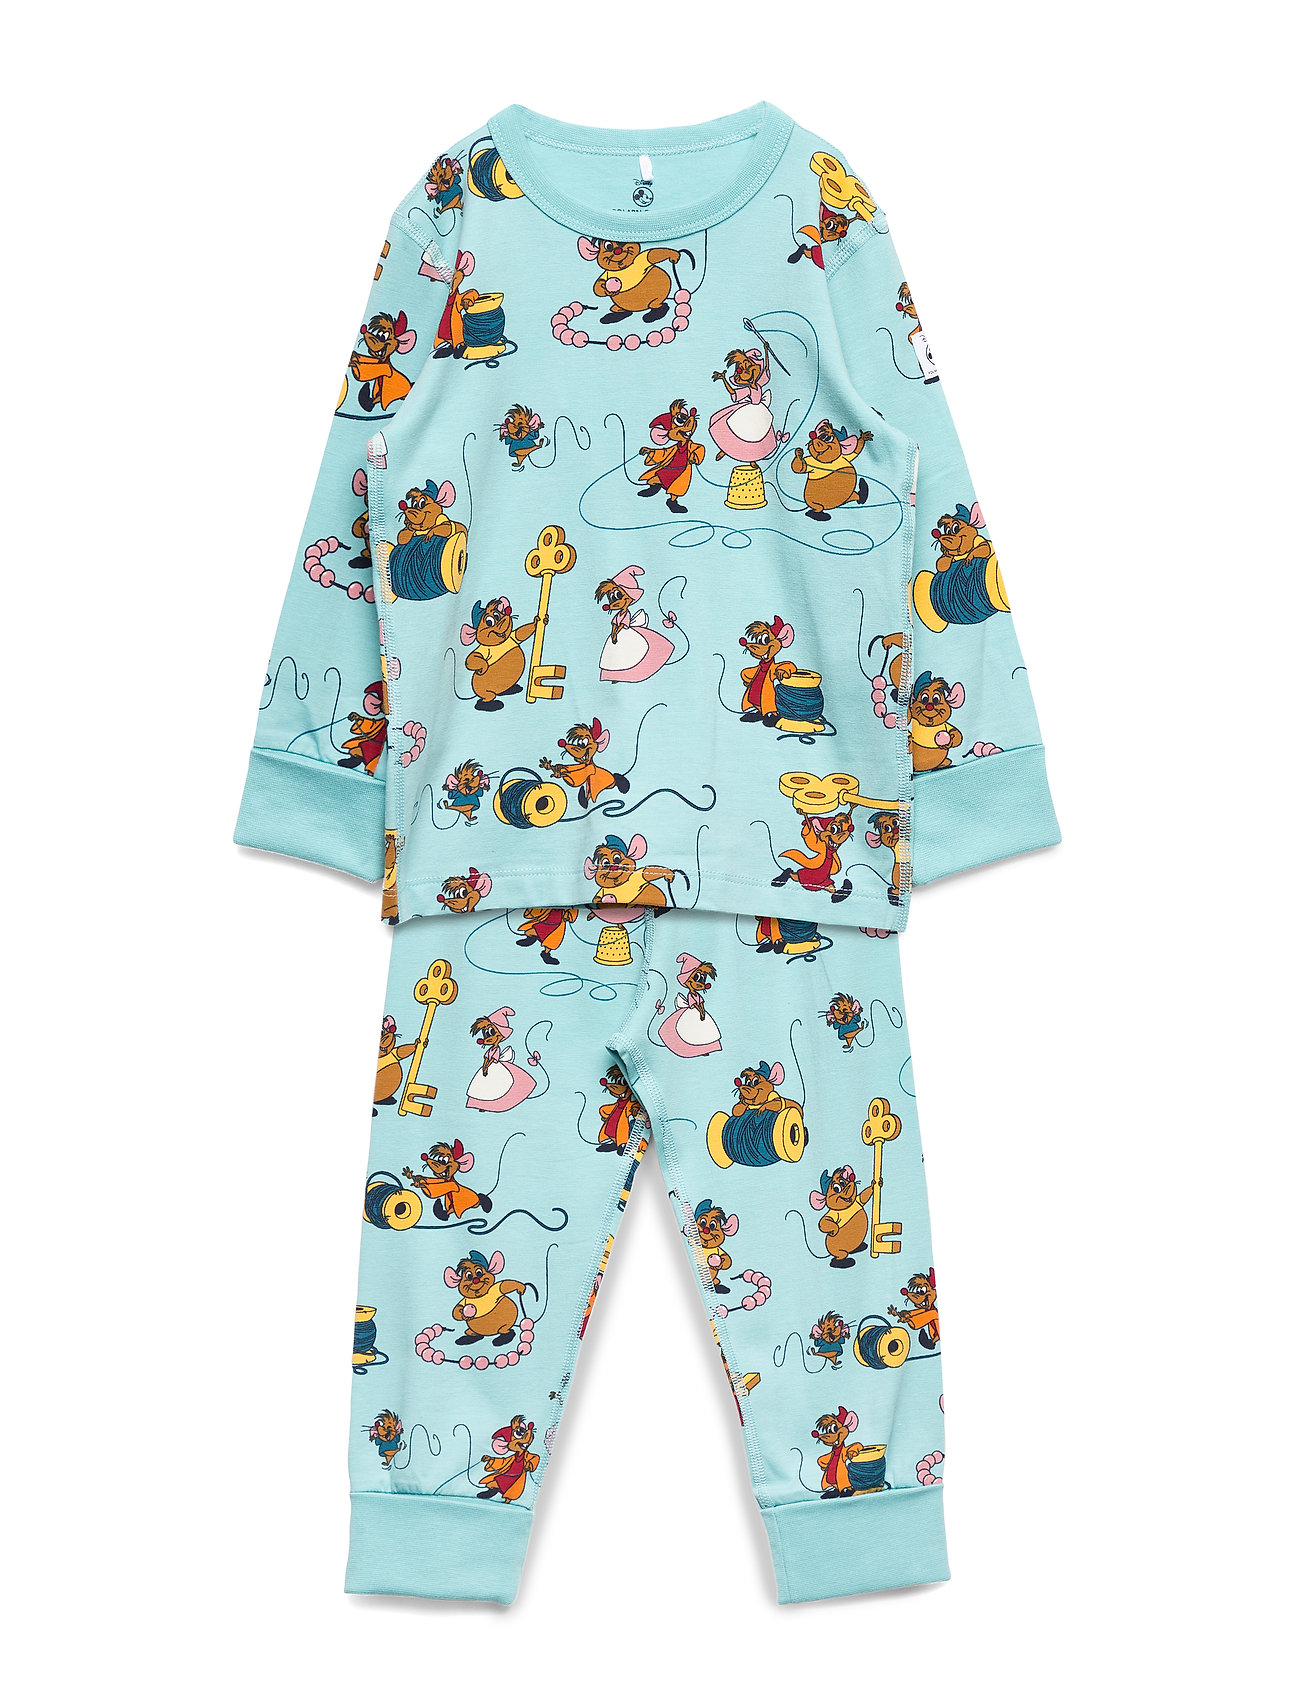 Polarn O. Pyret Disney Collection Pyjamas AOP Preschool - MARINE BLUE